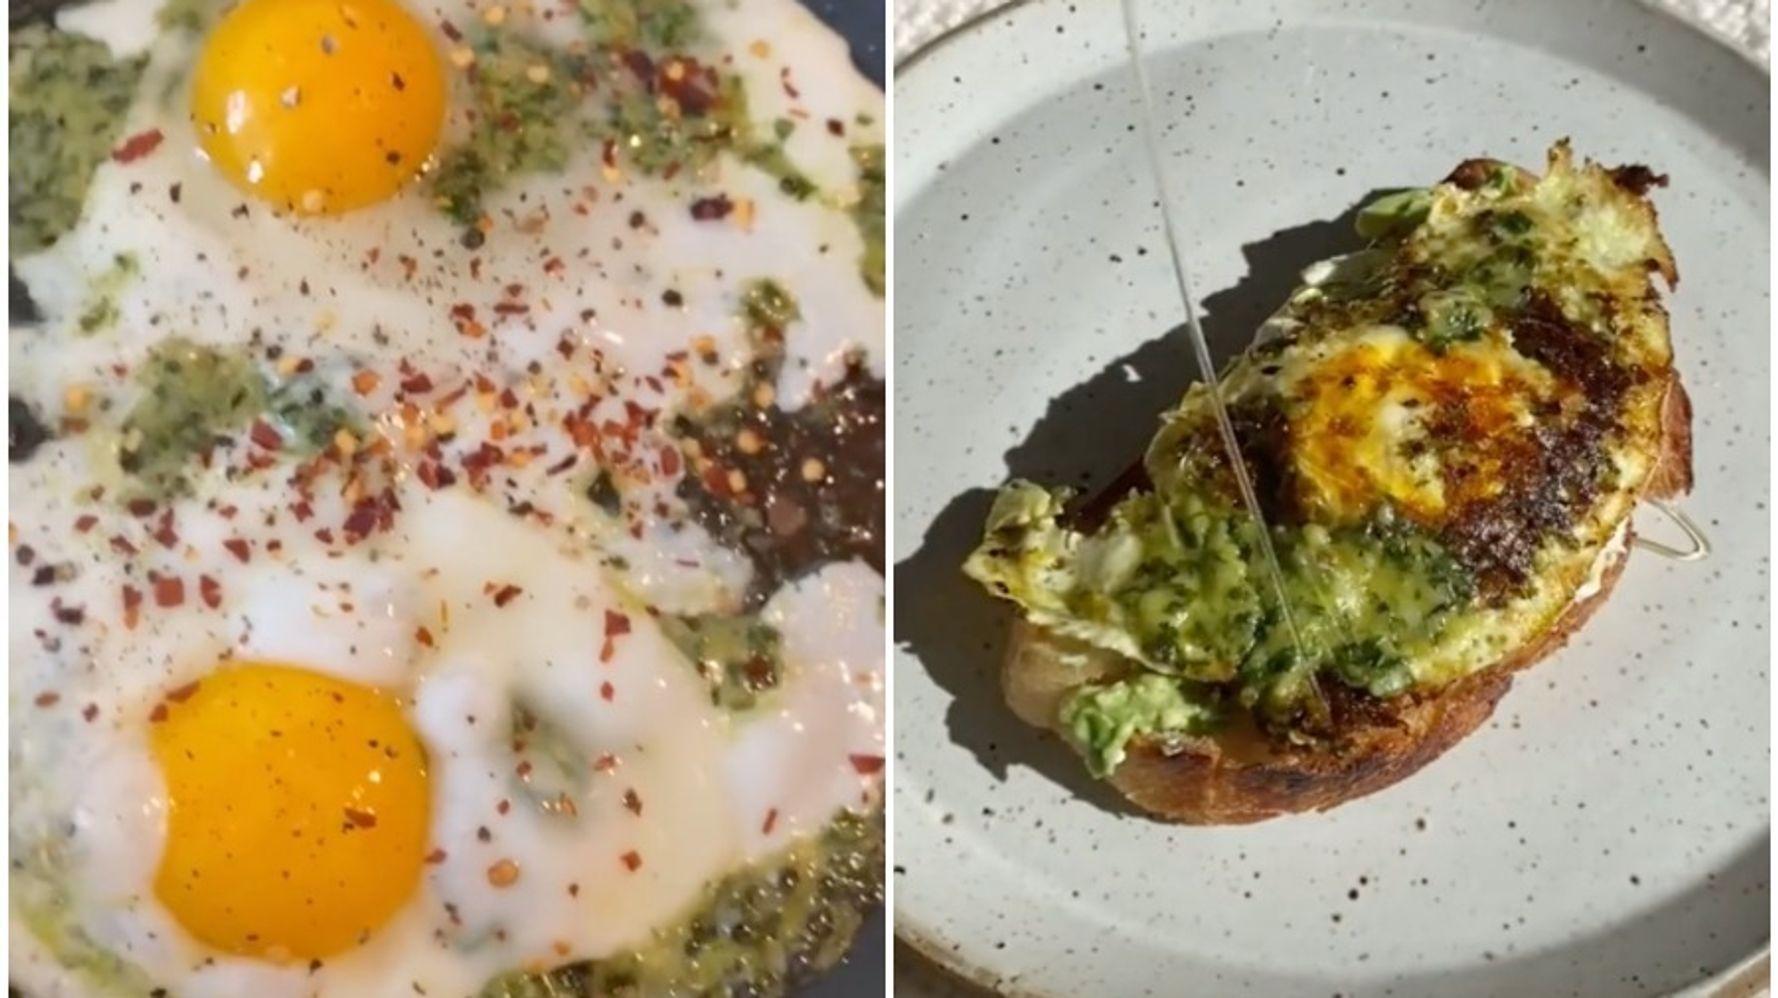 Love Pesto Eggs? 4 Ways To Make The TikTok Recipe Even Better